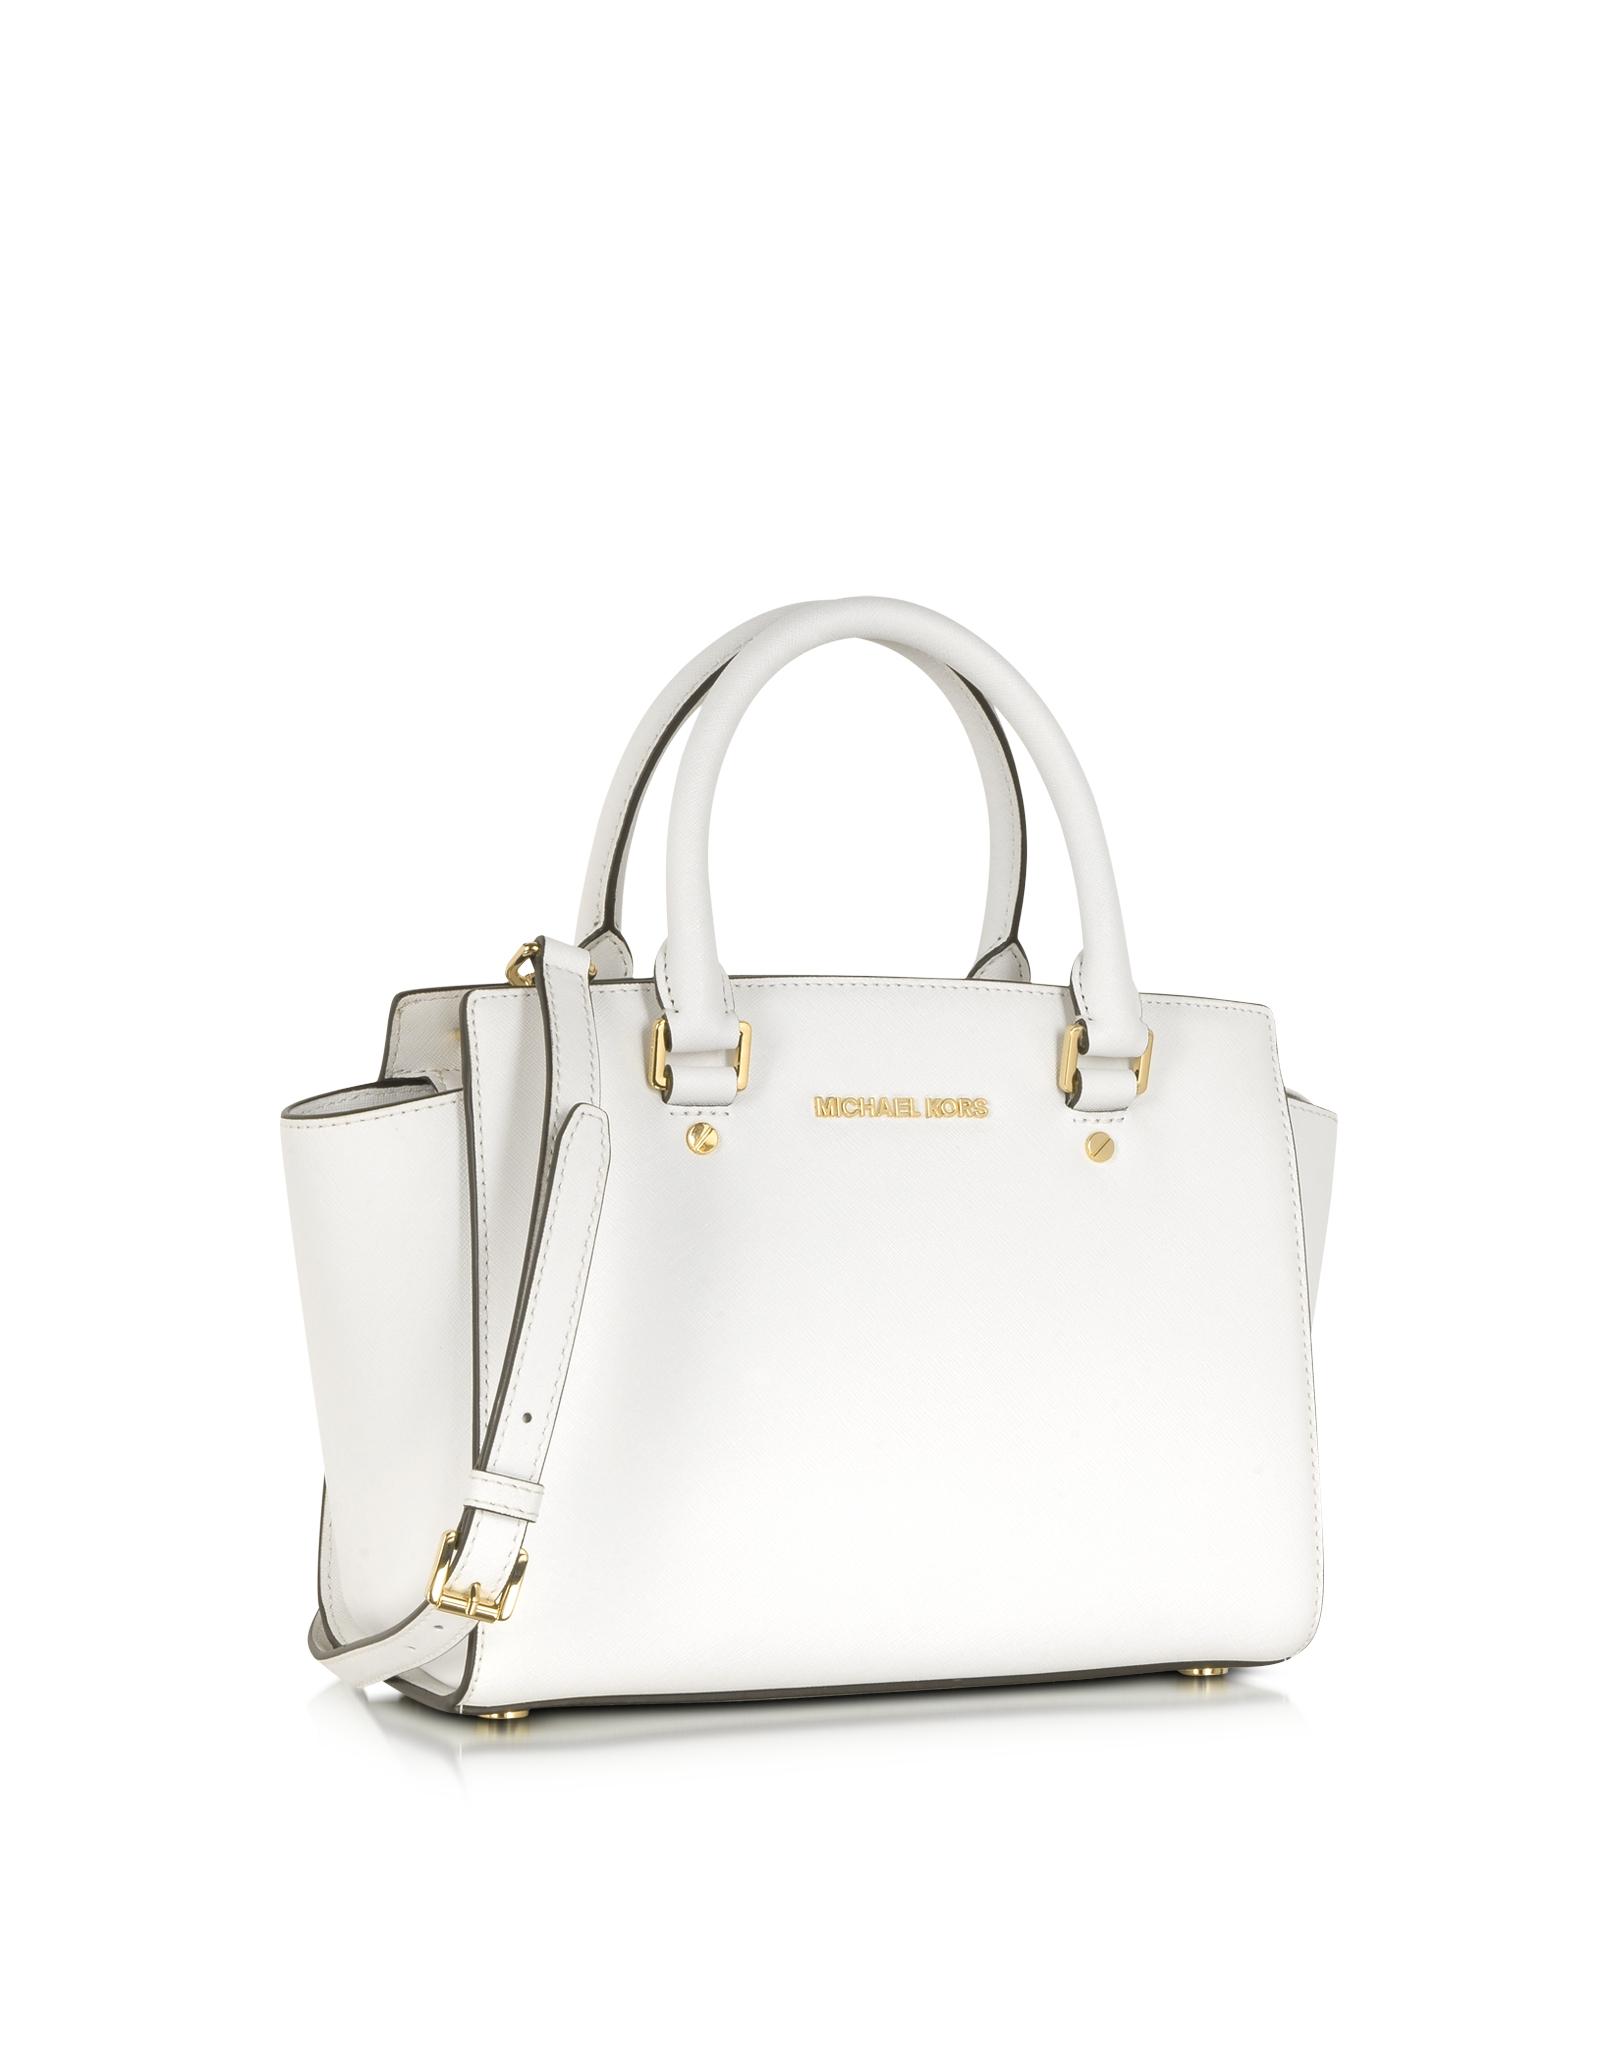 michael kors medium selma top zip satchel in white optic white lyst. Black Bedroom Furniture Sets. Home Design Ideas